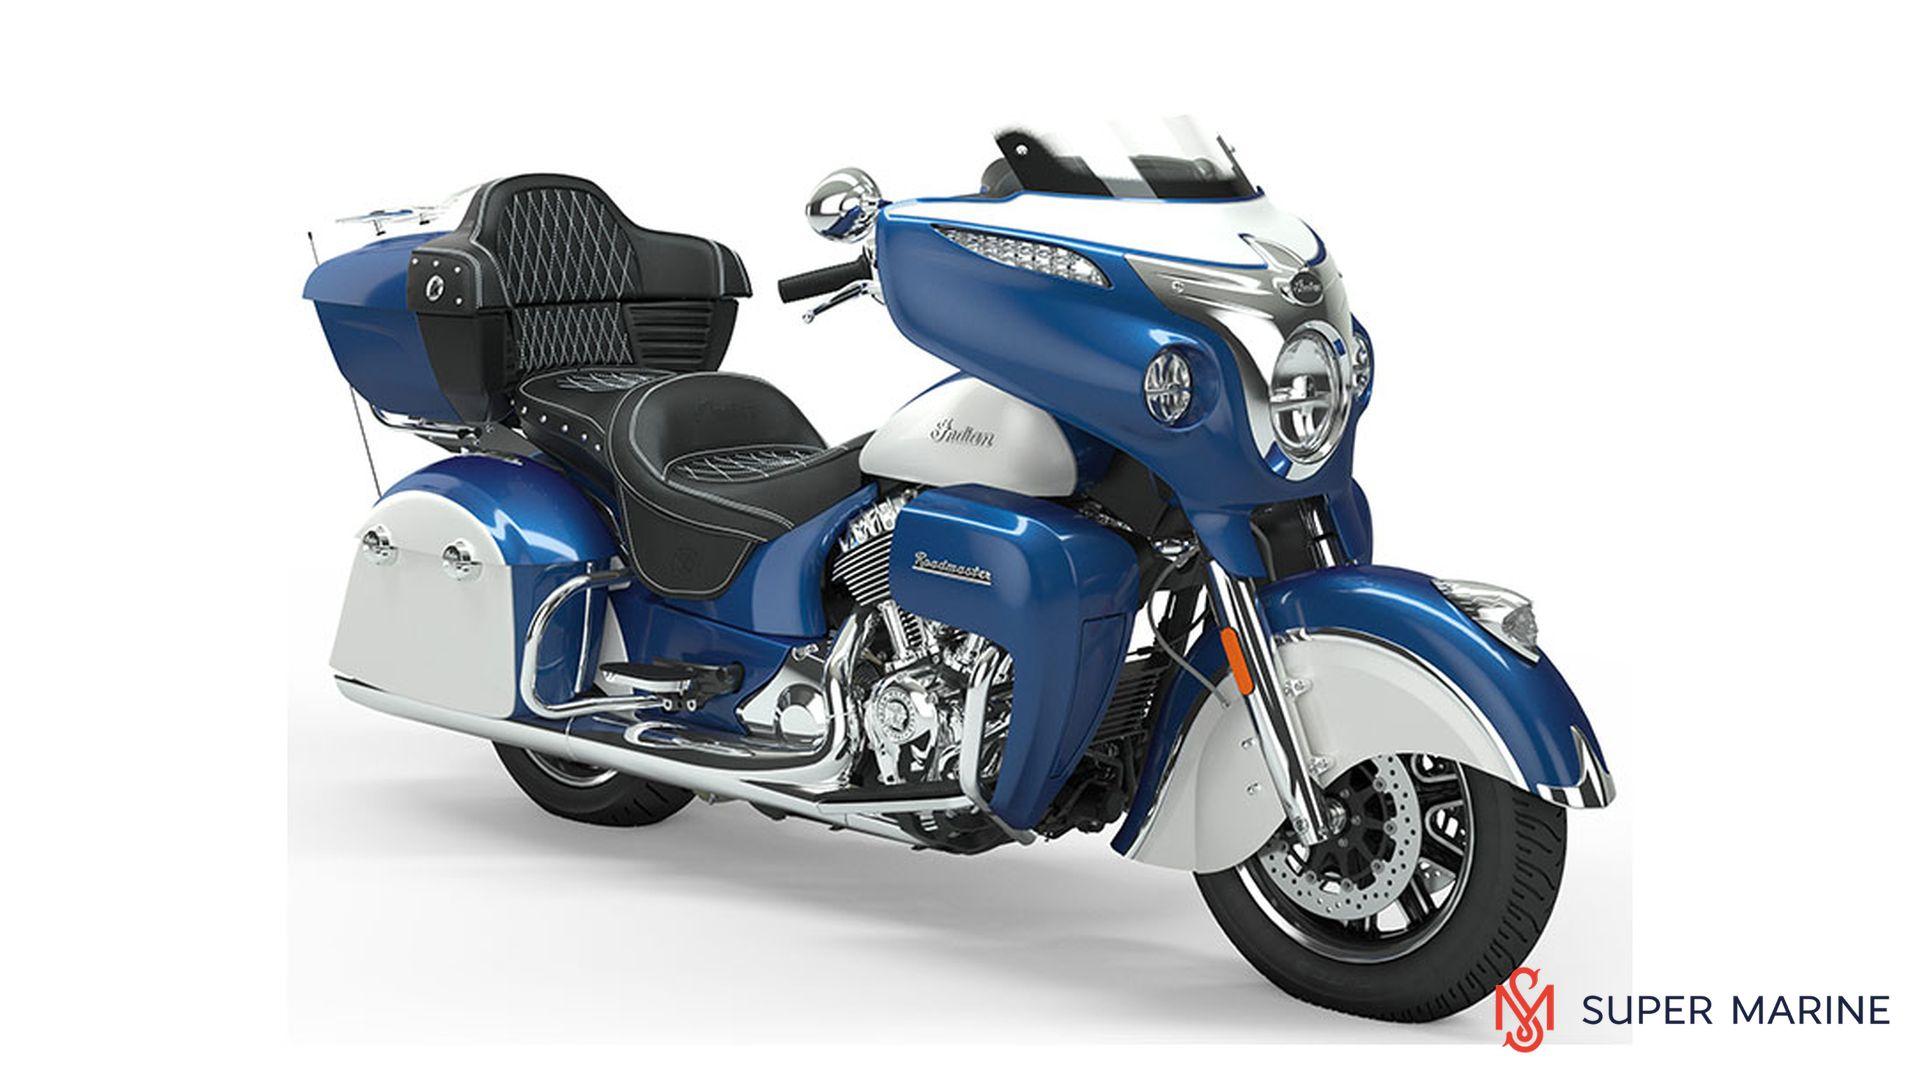 Мотоцикл Indian Roadmaster Icon Brilliant Blue over Pearl White 2019 - 1